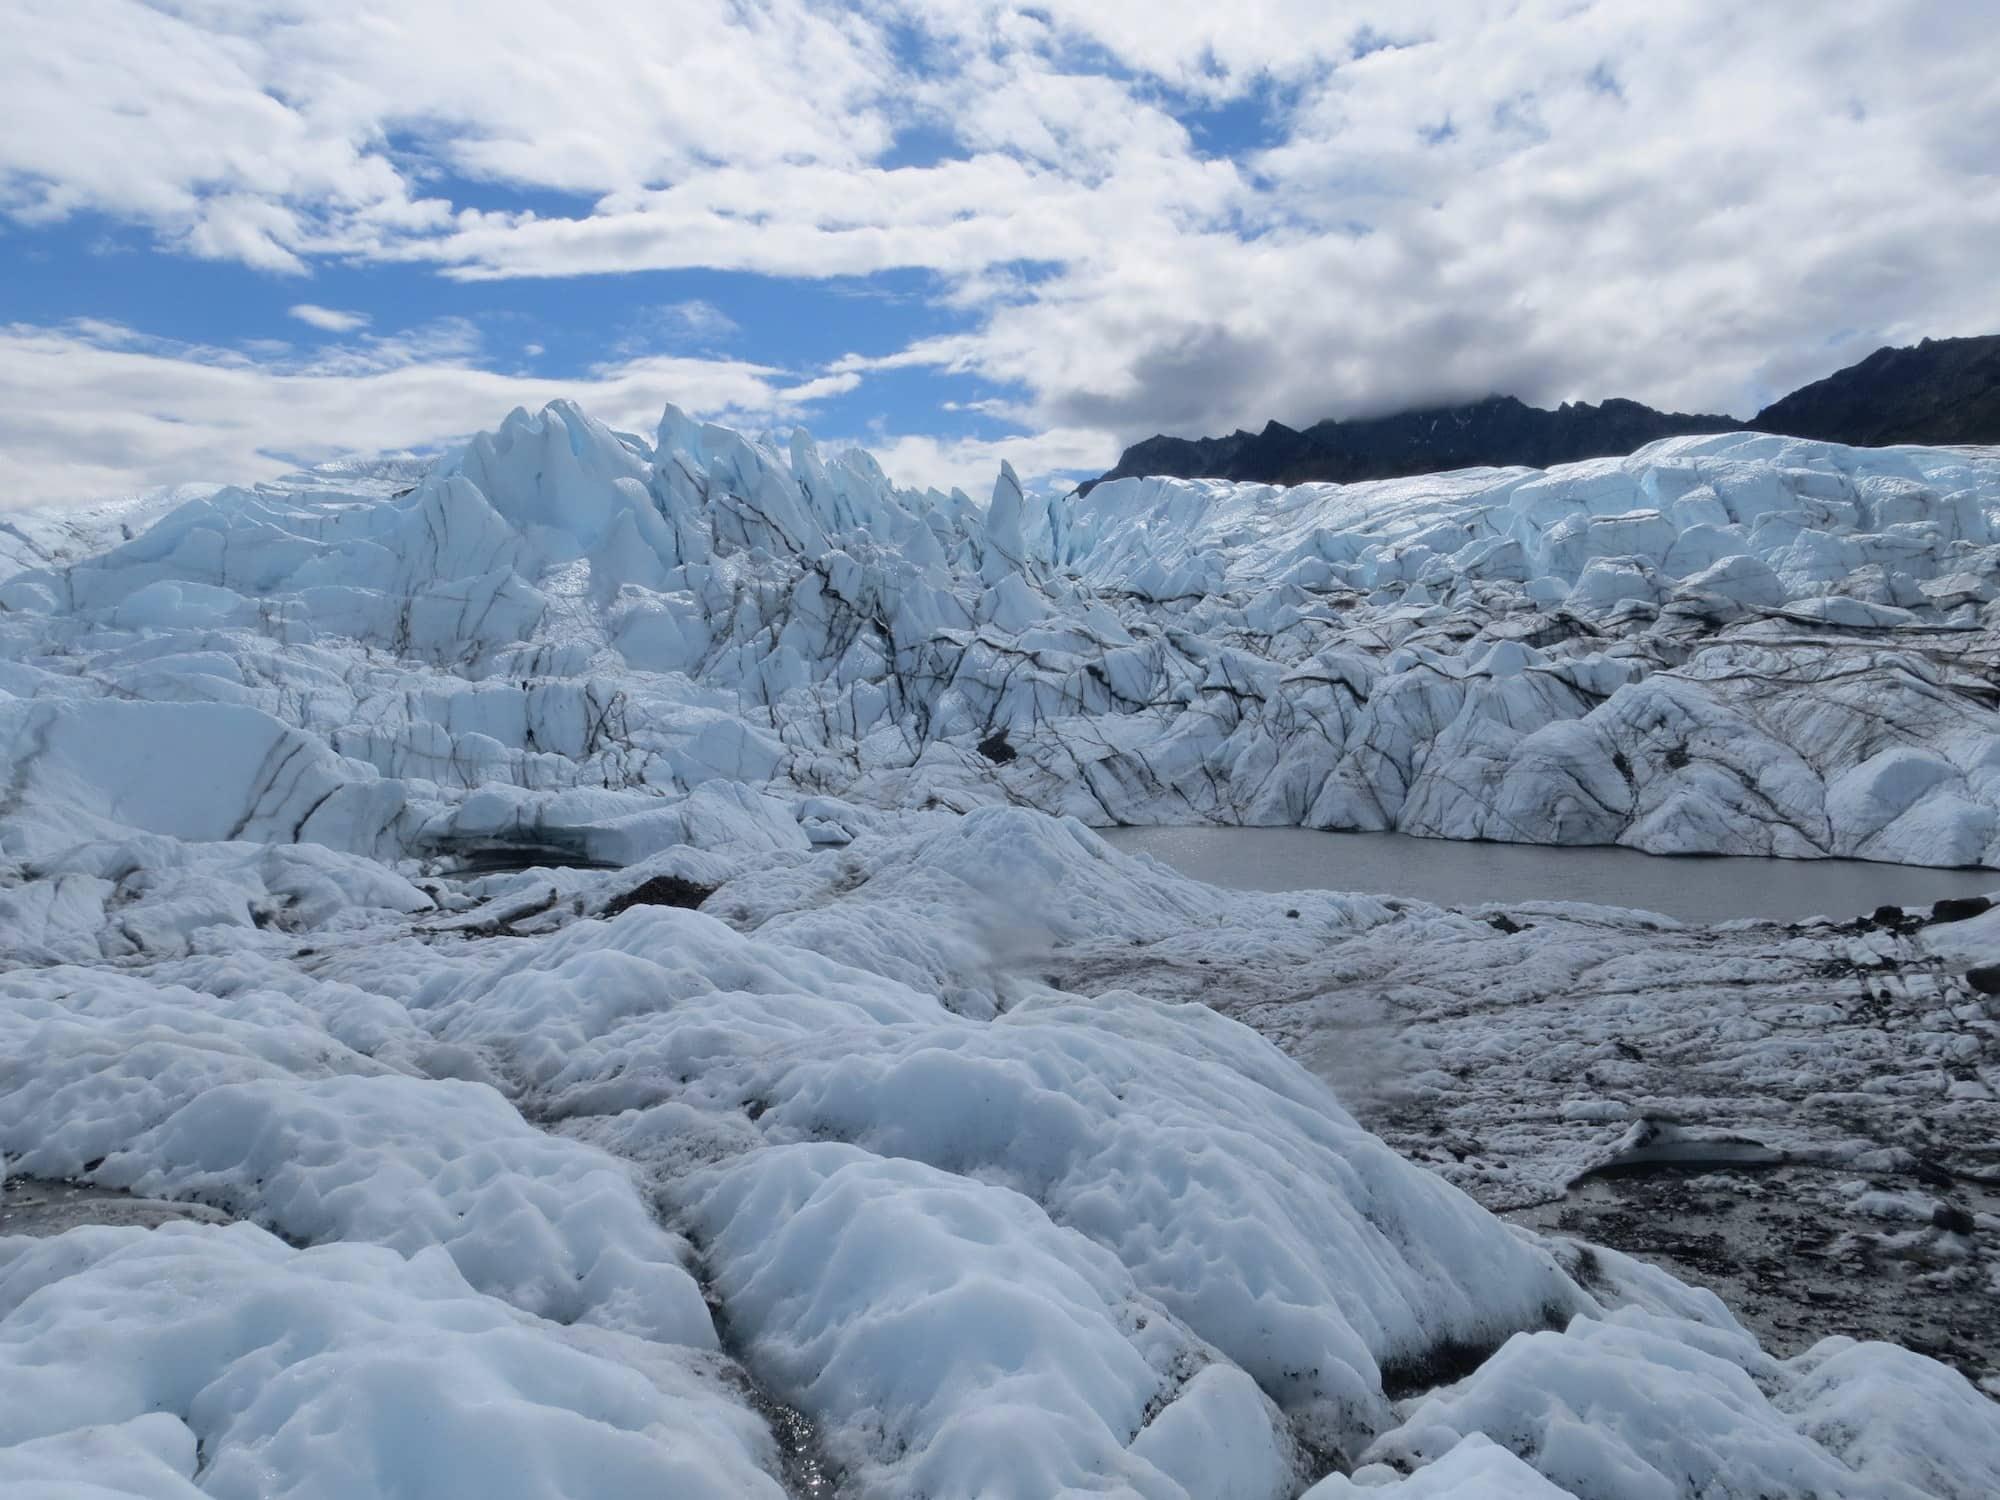 Matanuska Glacier // This Alaska road trip itinerary will take you through the best of the state including Kenai Fjords & Denali National Park.